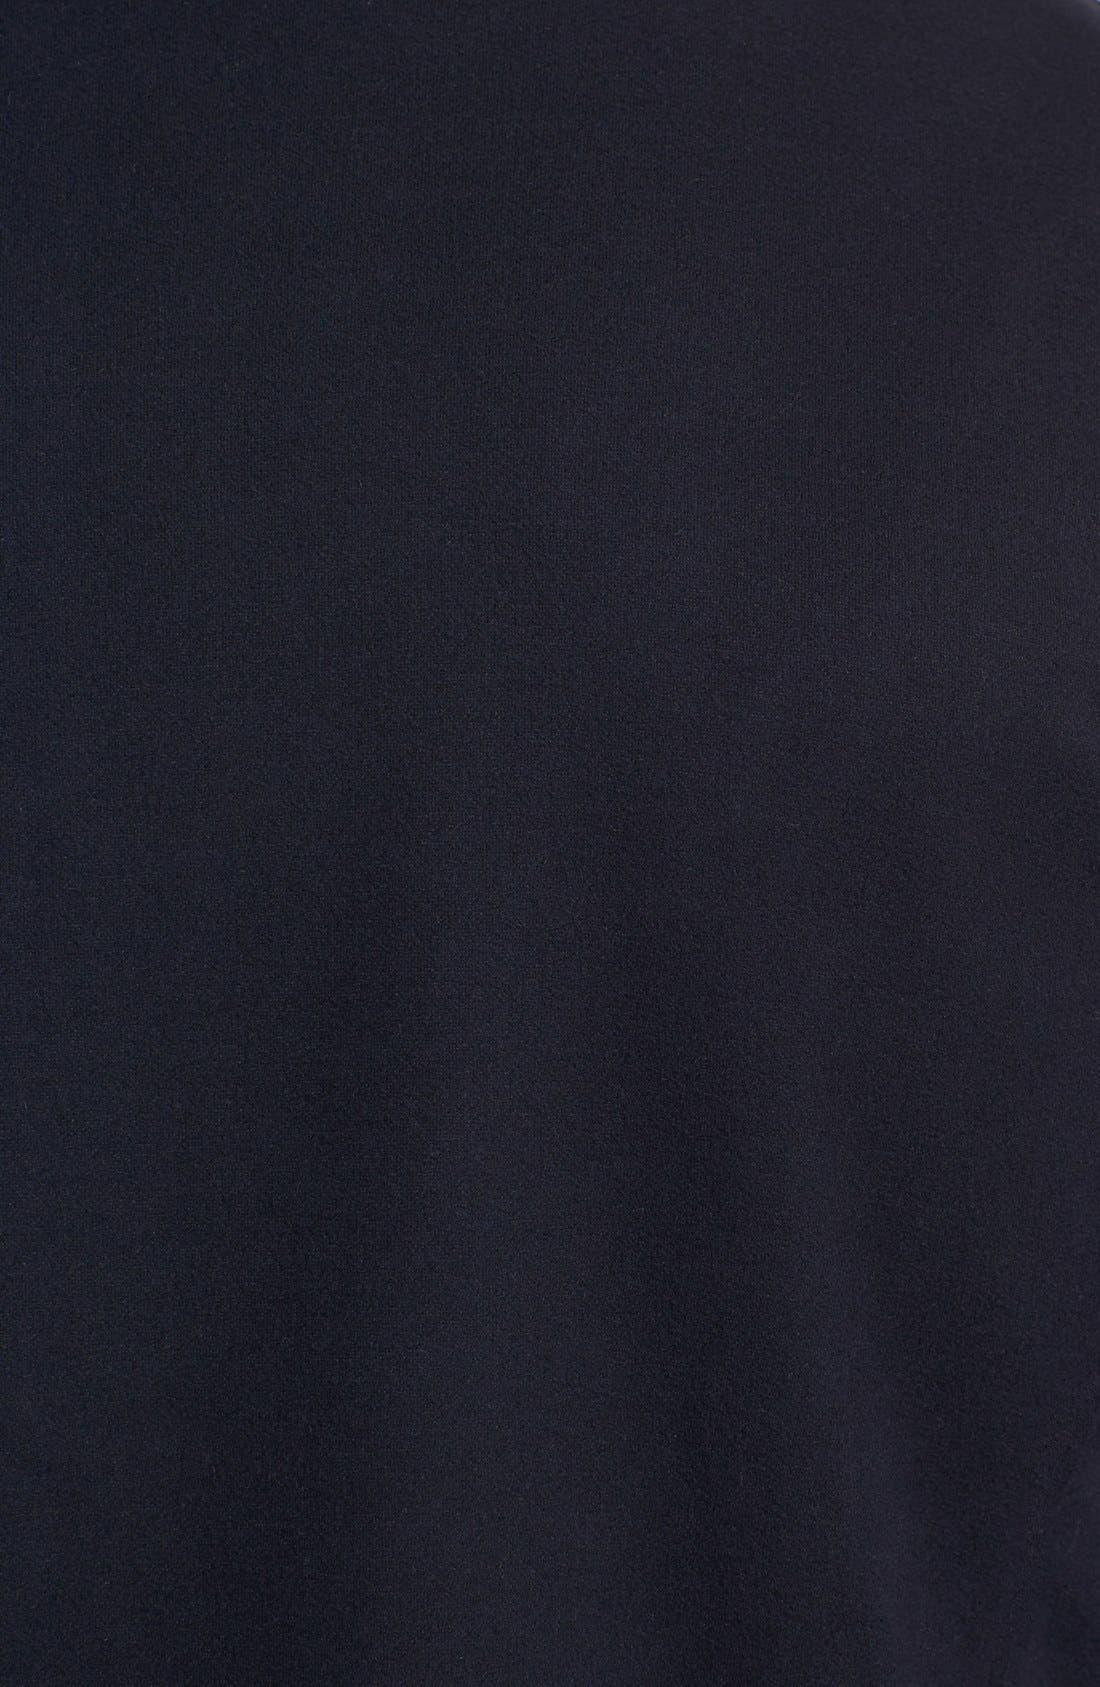 Alternate Image 3  - Victorinox Swiss Army® 'Matterhorn' Tailored Fit Fleece Jacket